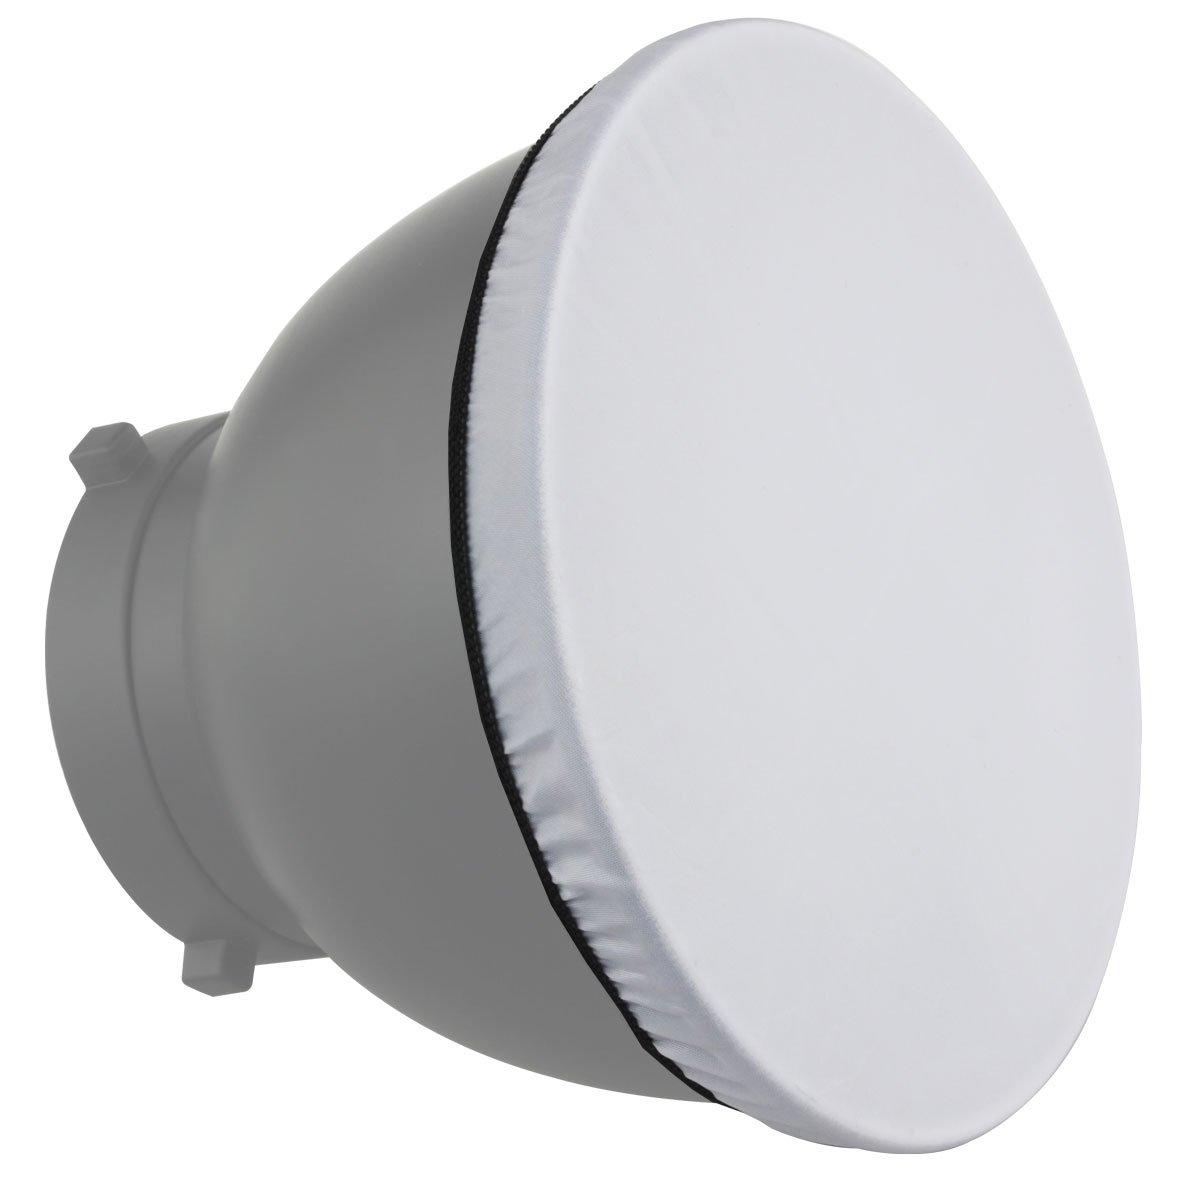 "Haoge 7"" 180mm Soft White Diffuser Sock for Studio Strobe Reflector"